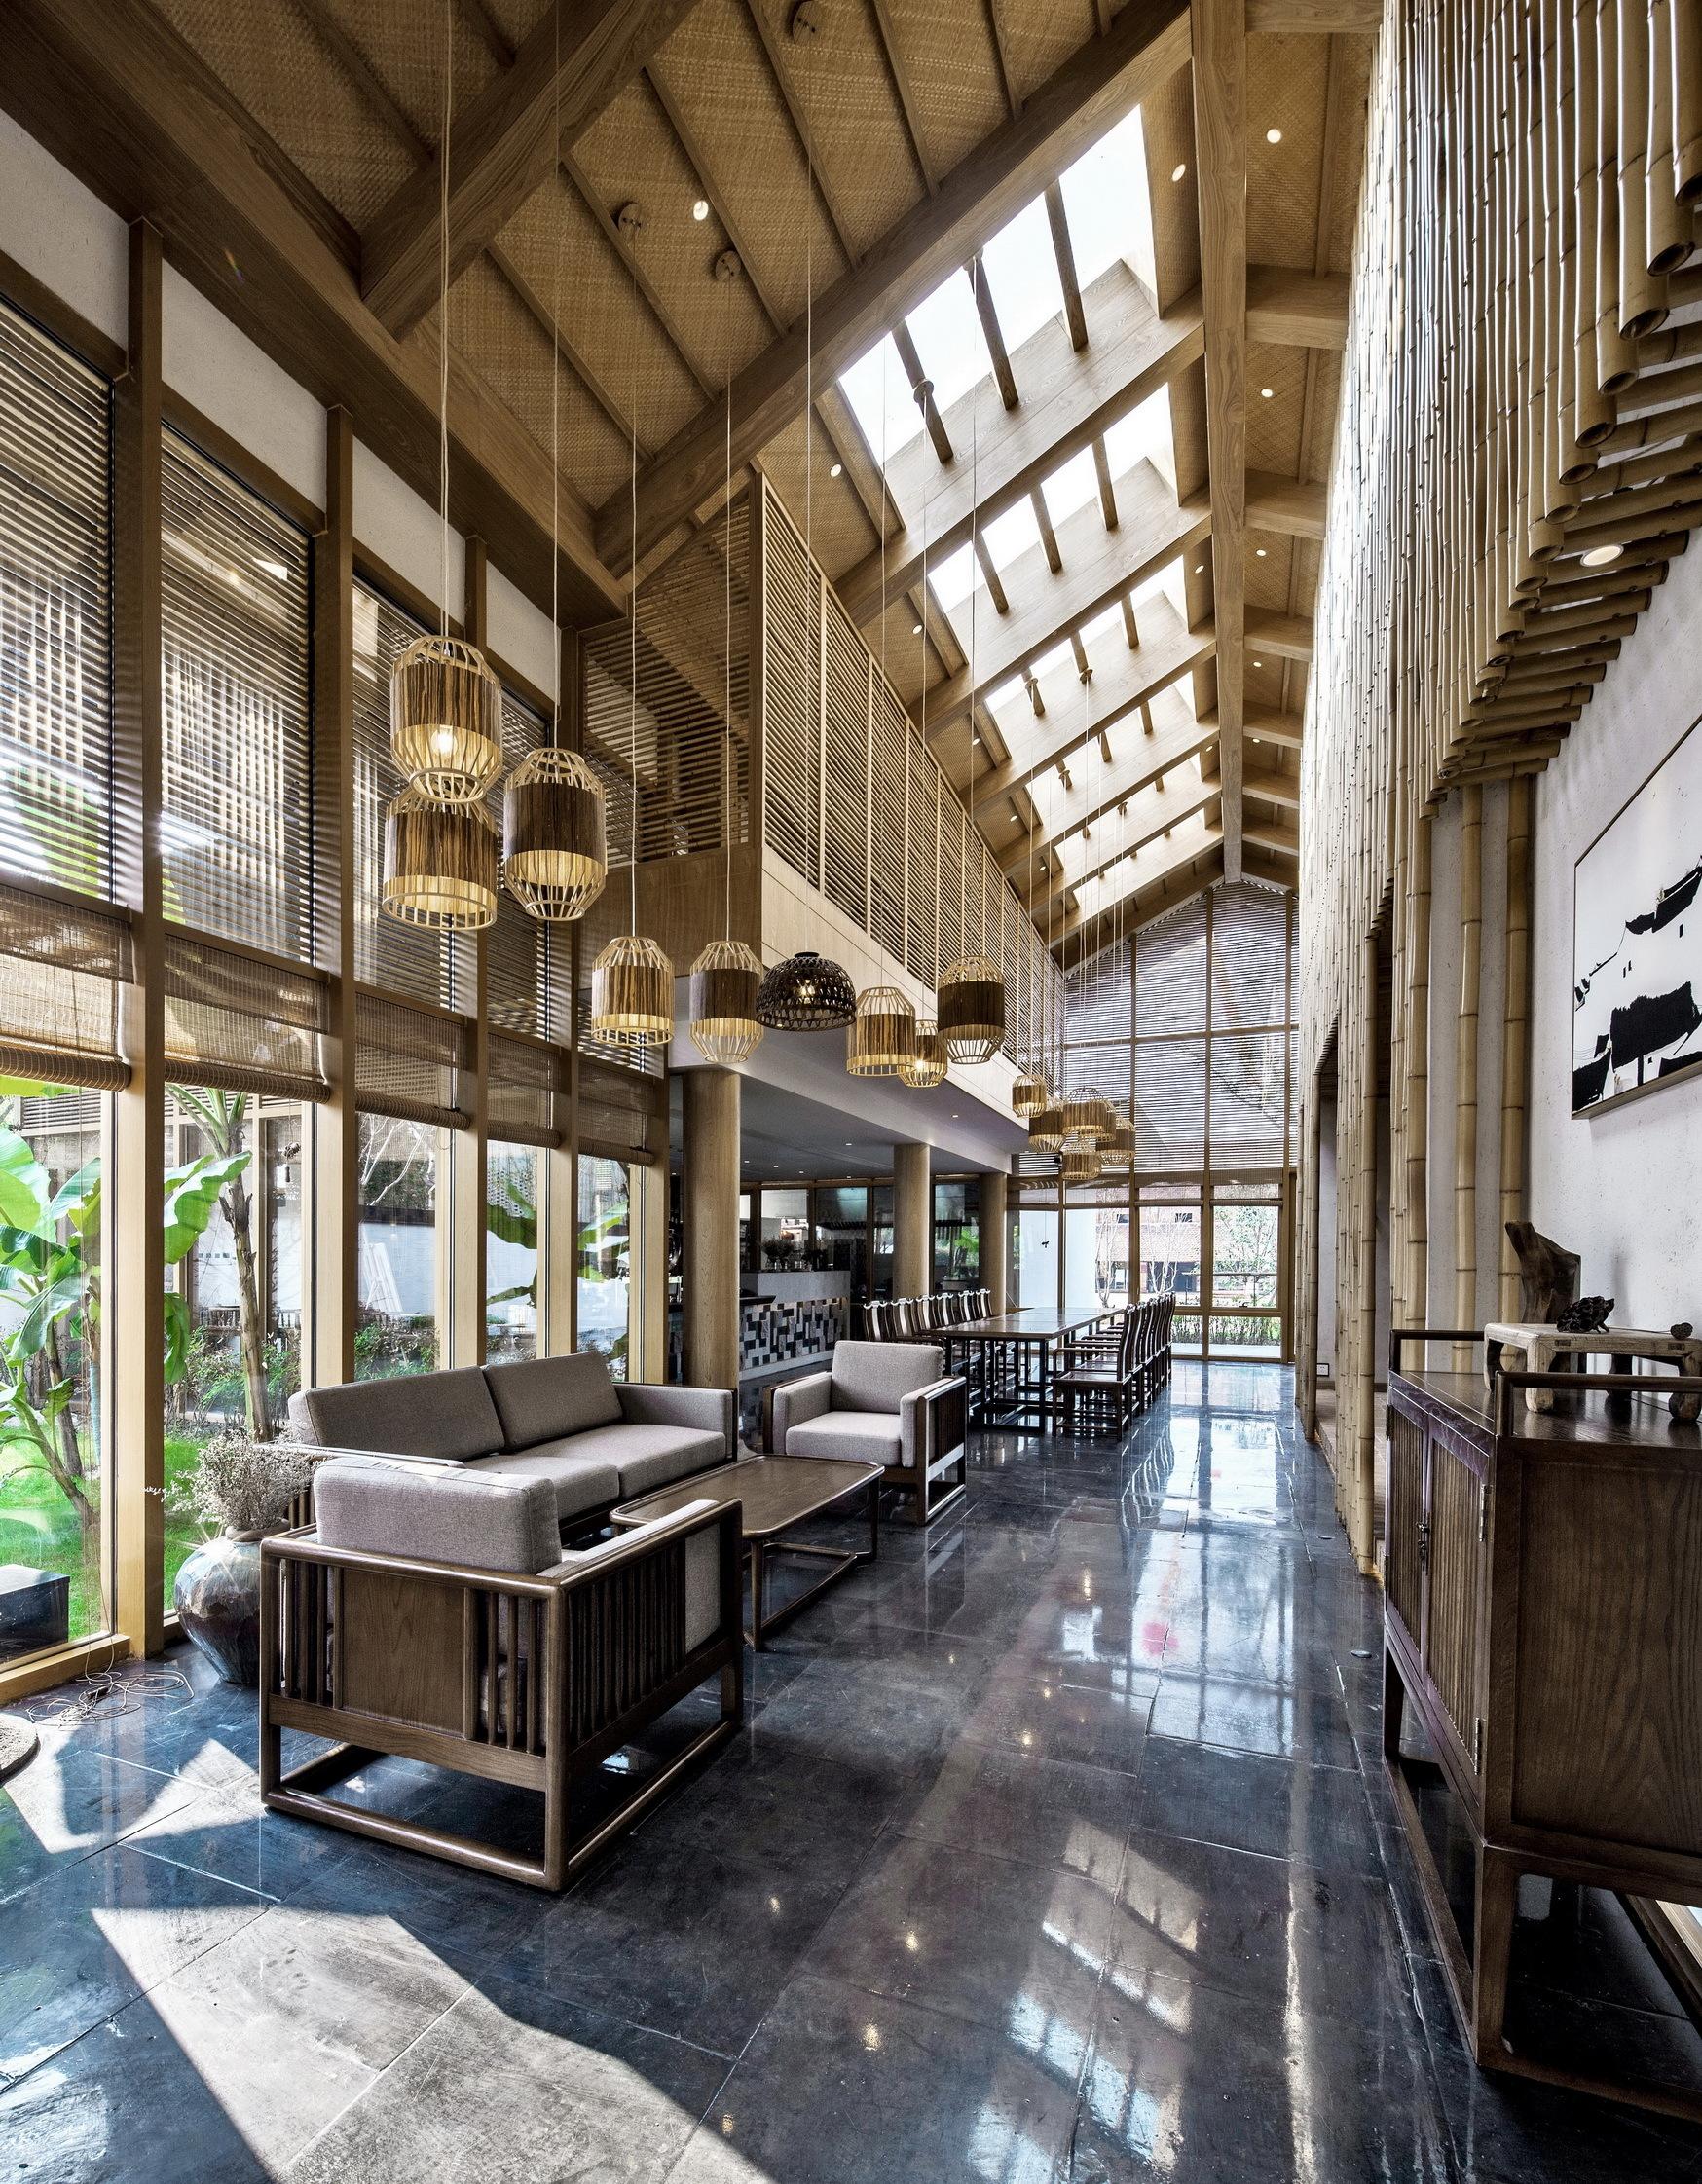 Brick Kiln Folk Inn & Museum - Interior Design 2